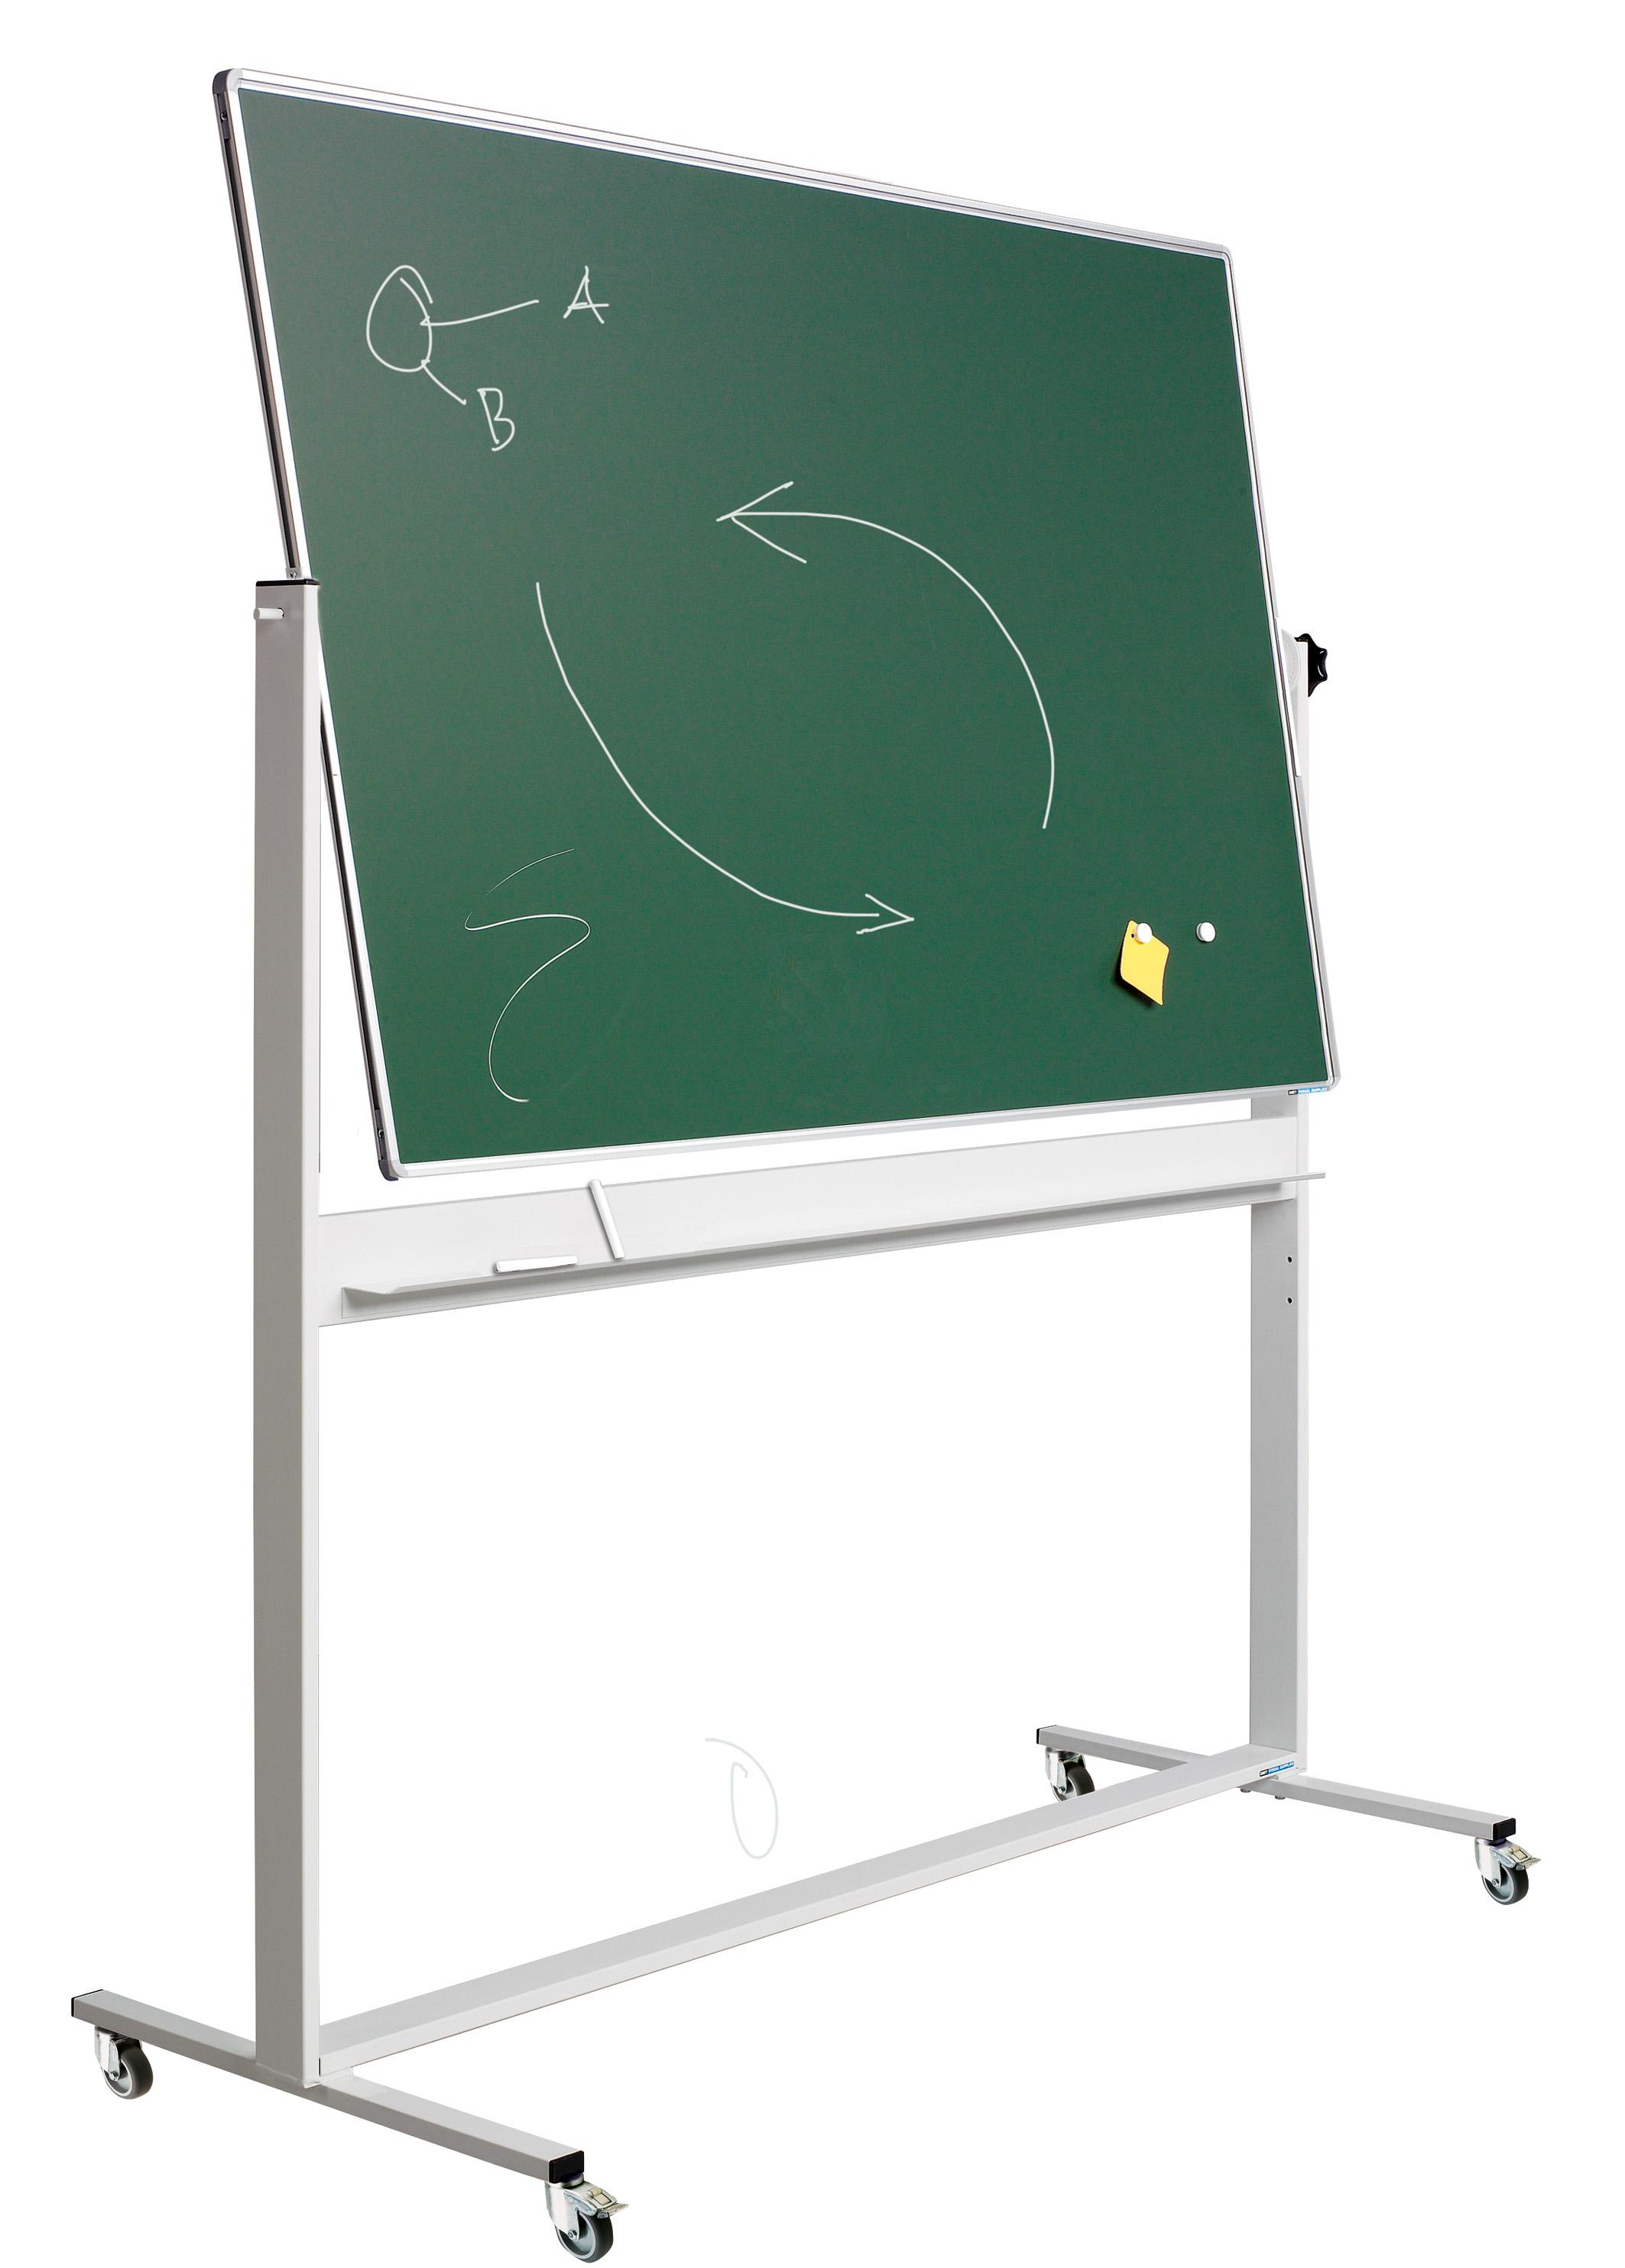 Kantelbord Solid RC10mm profiel, email groen/groen-90x120 cm